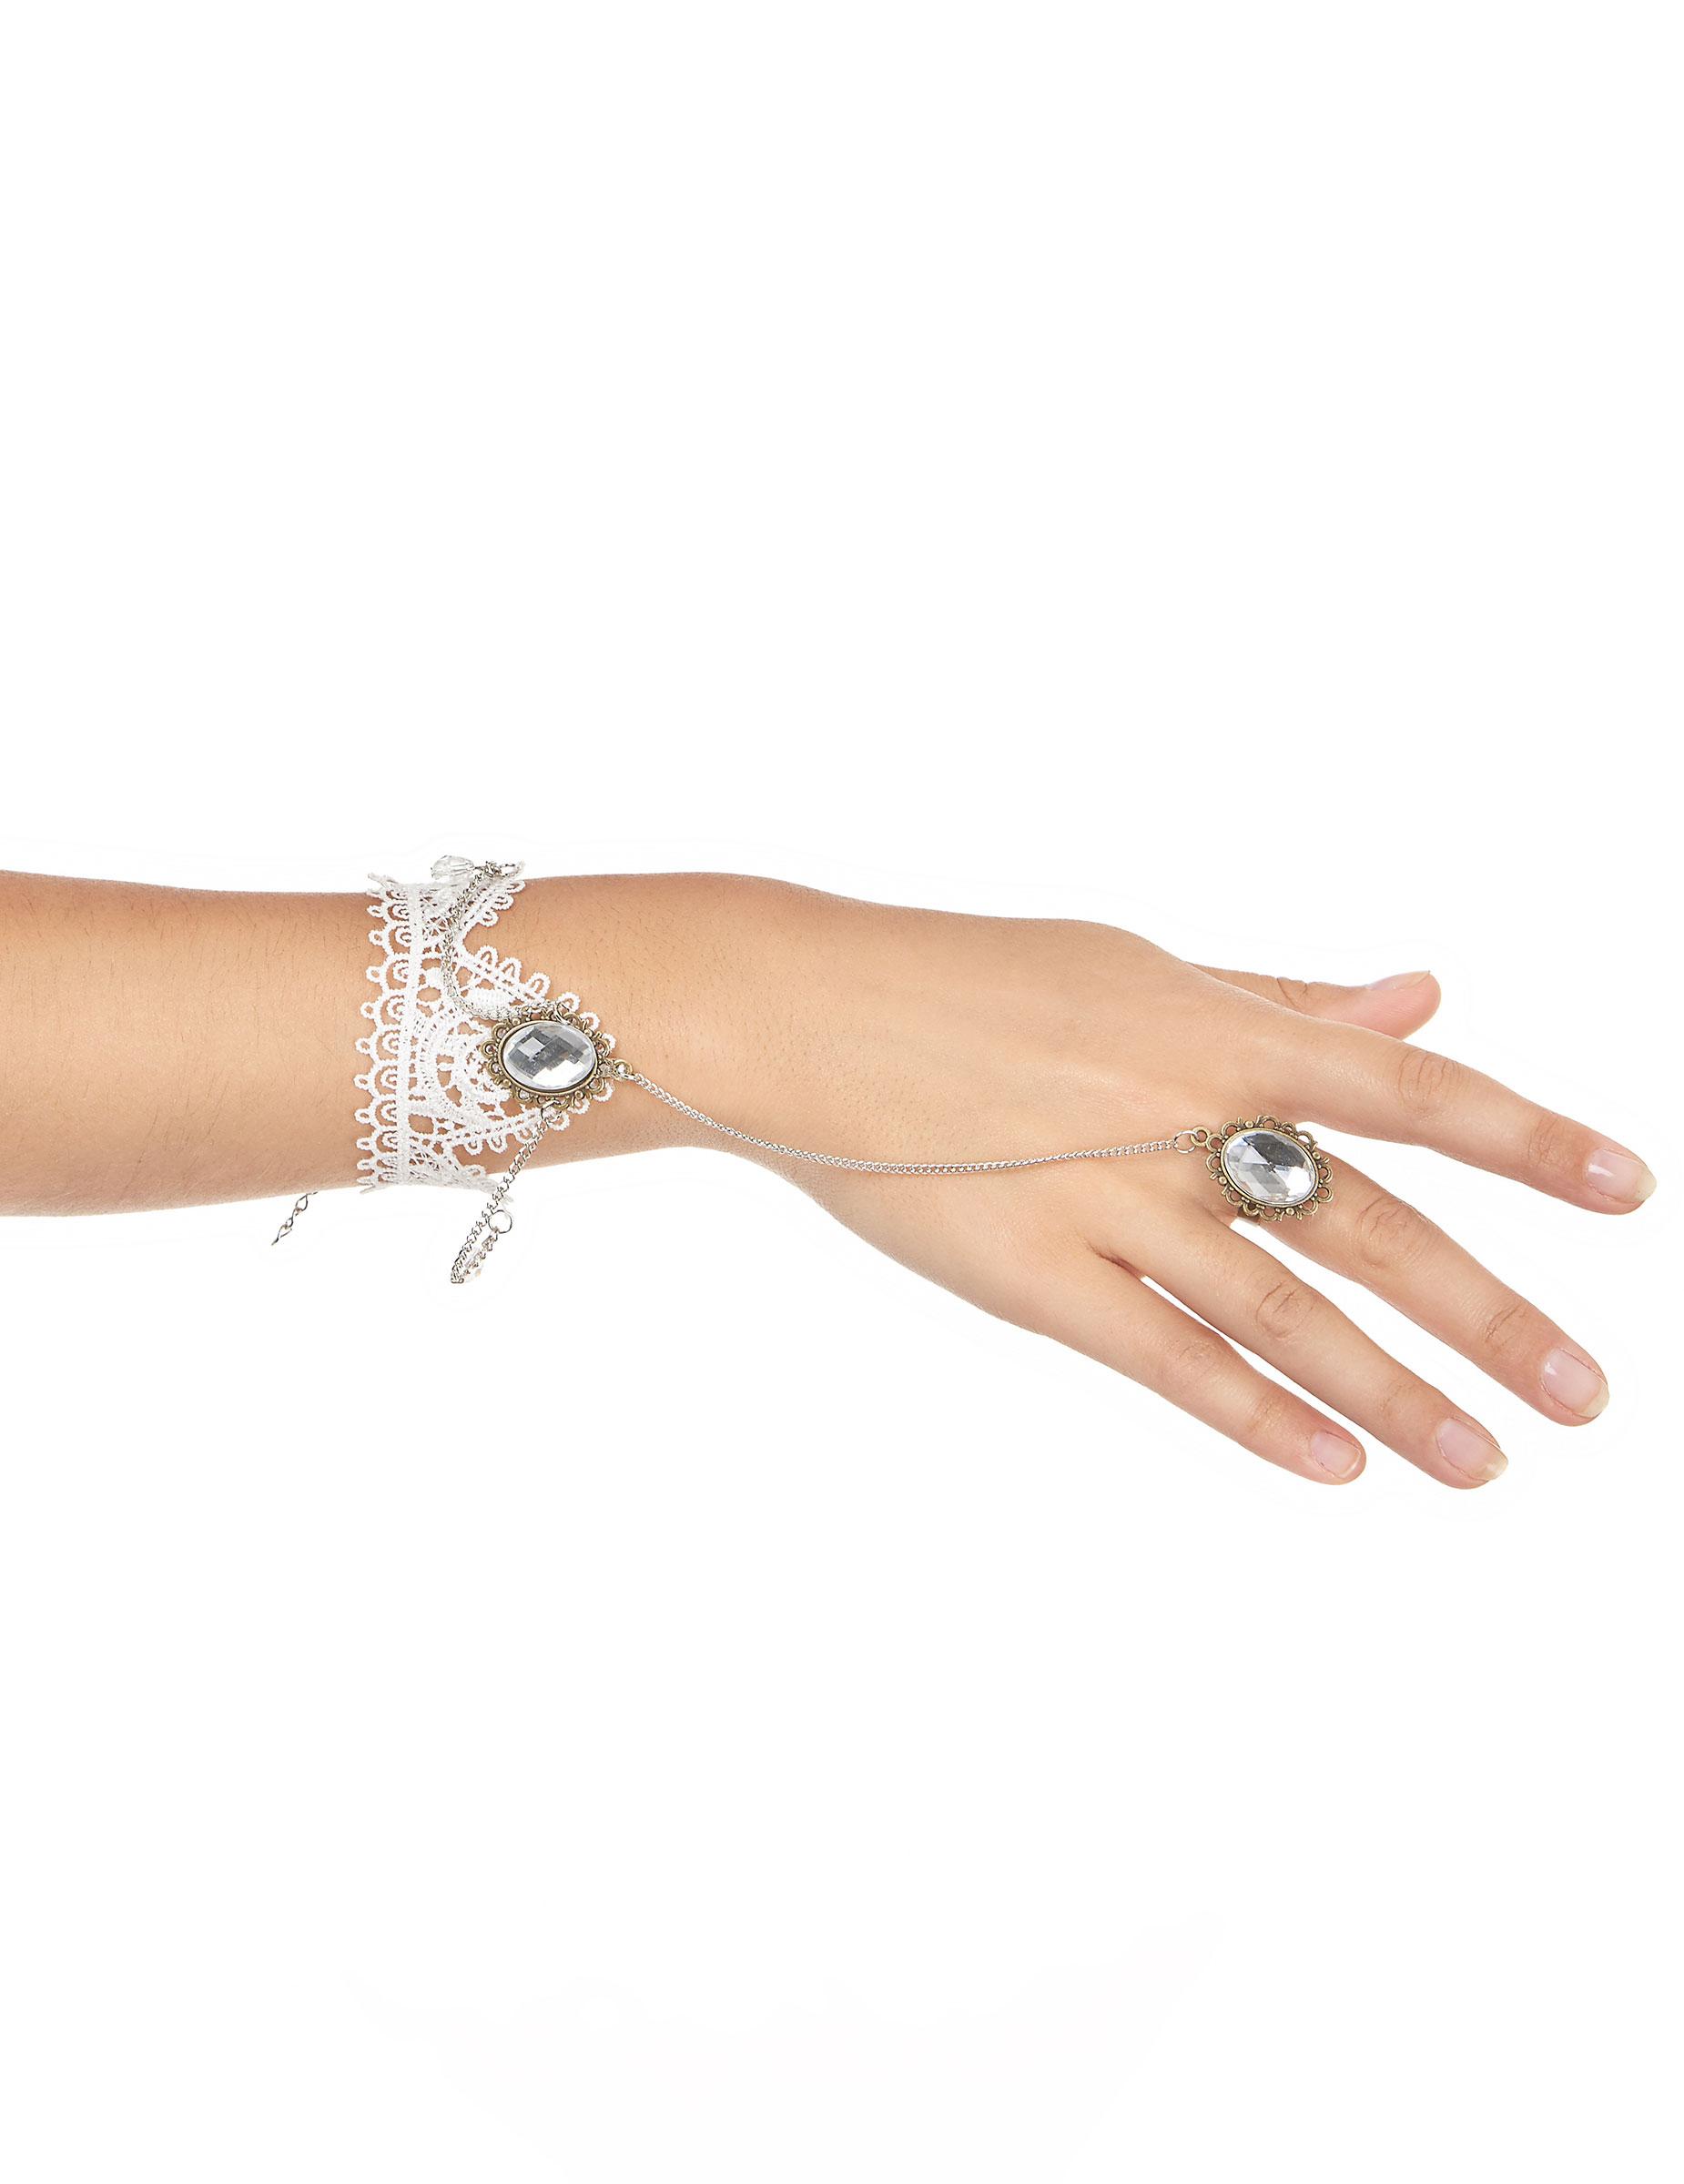 edles spitzen armband mit ring weiss silber g nstige faschings accessoires zubeh r bei. Black Bedroom Furniture Sets. Home Design Ideas